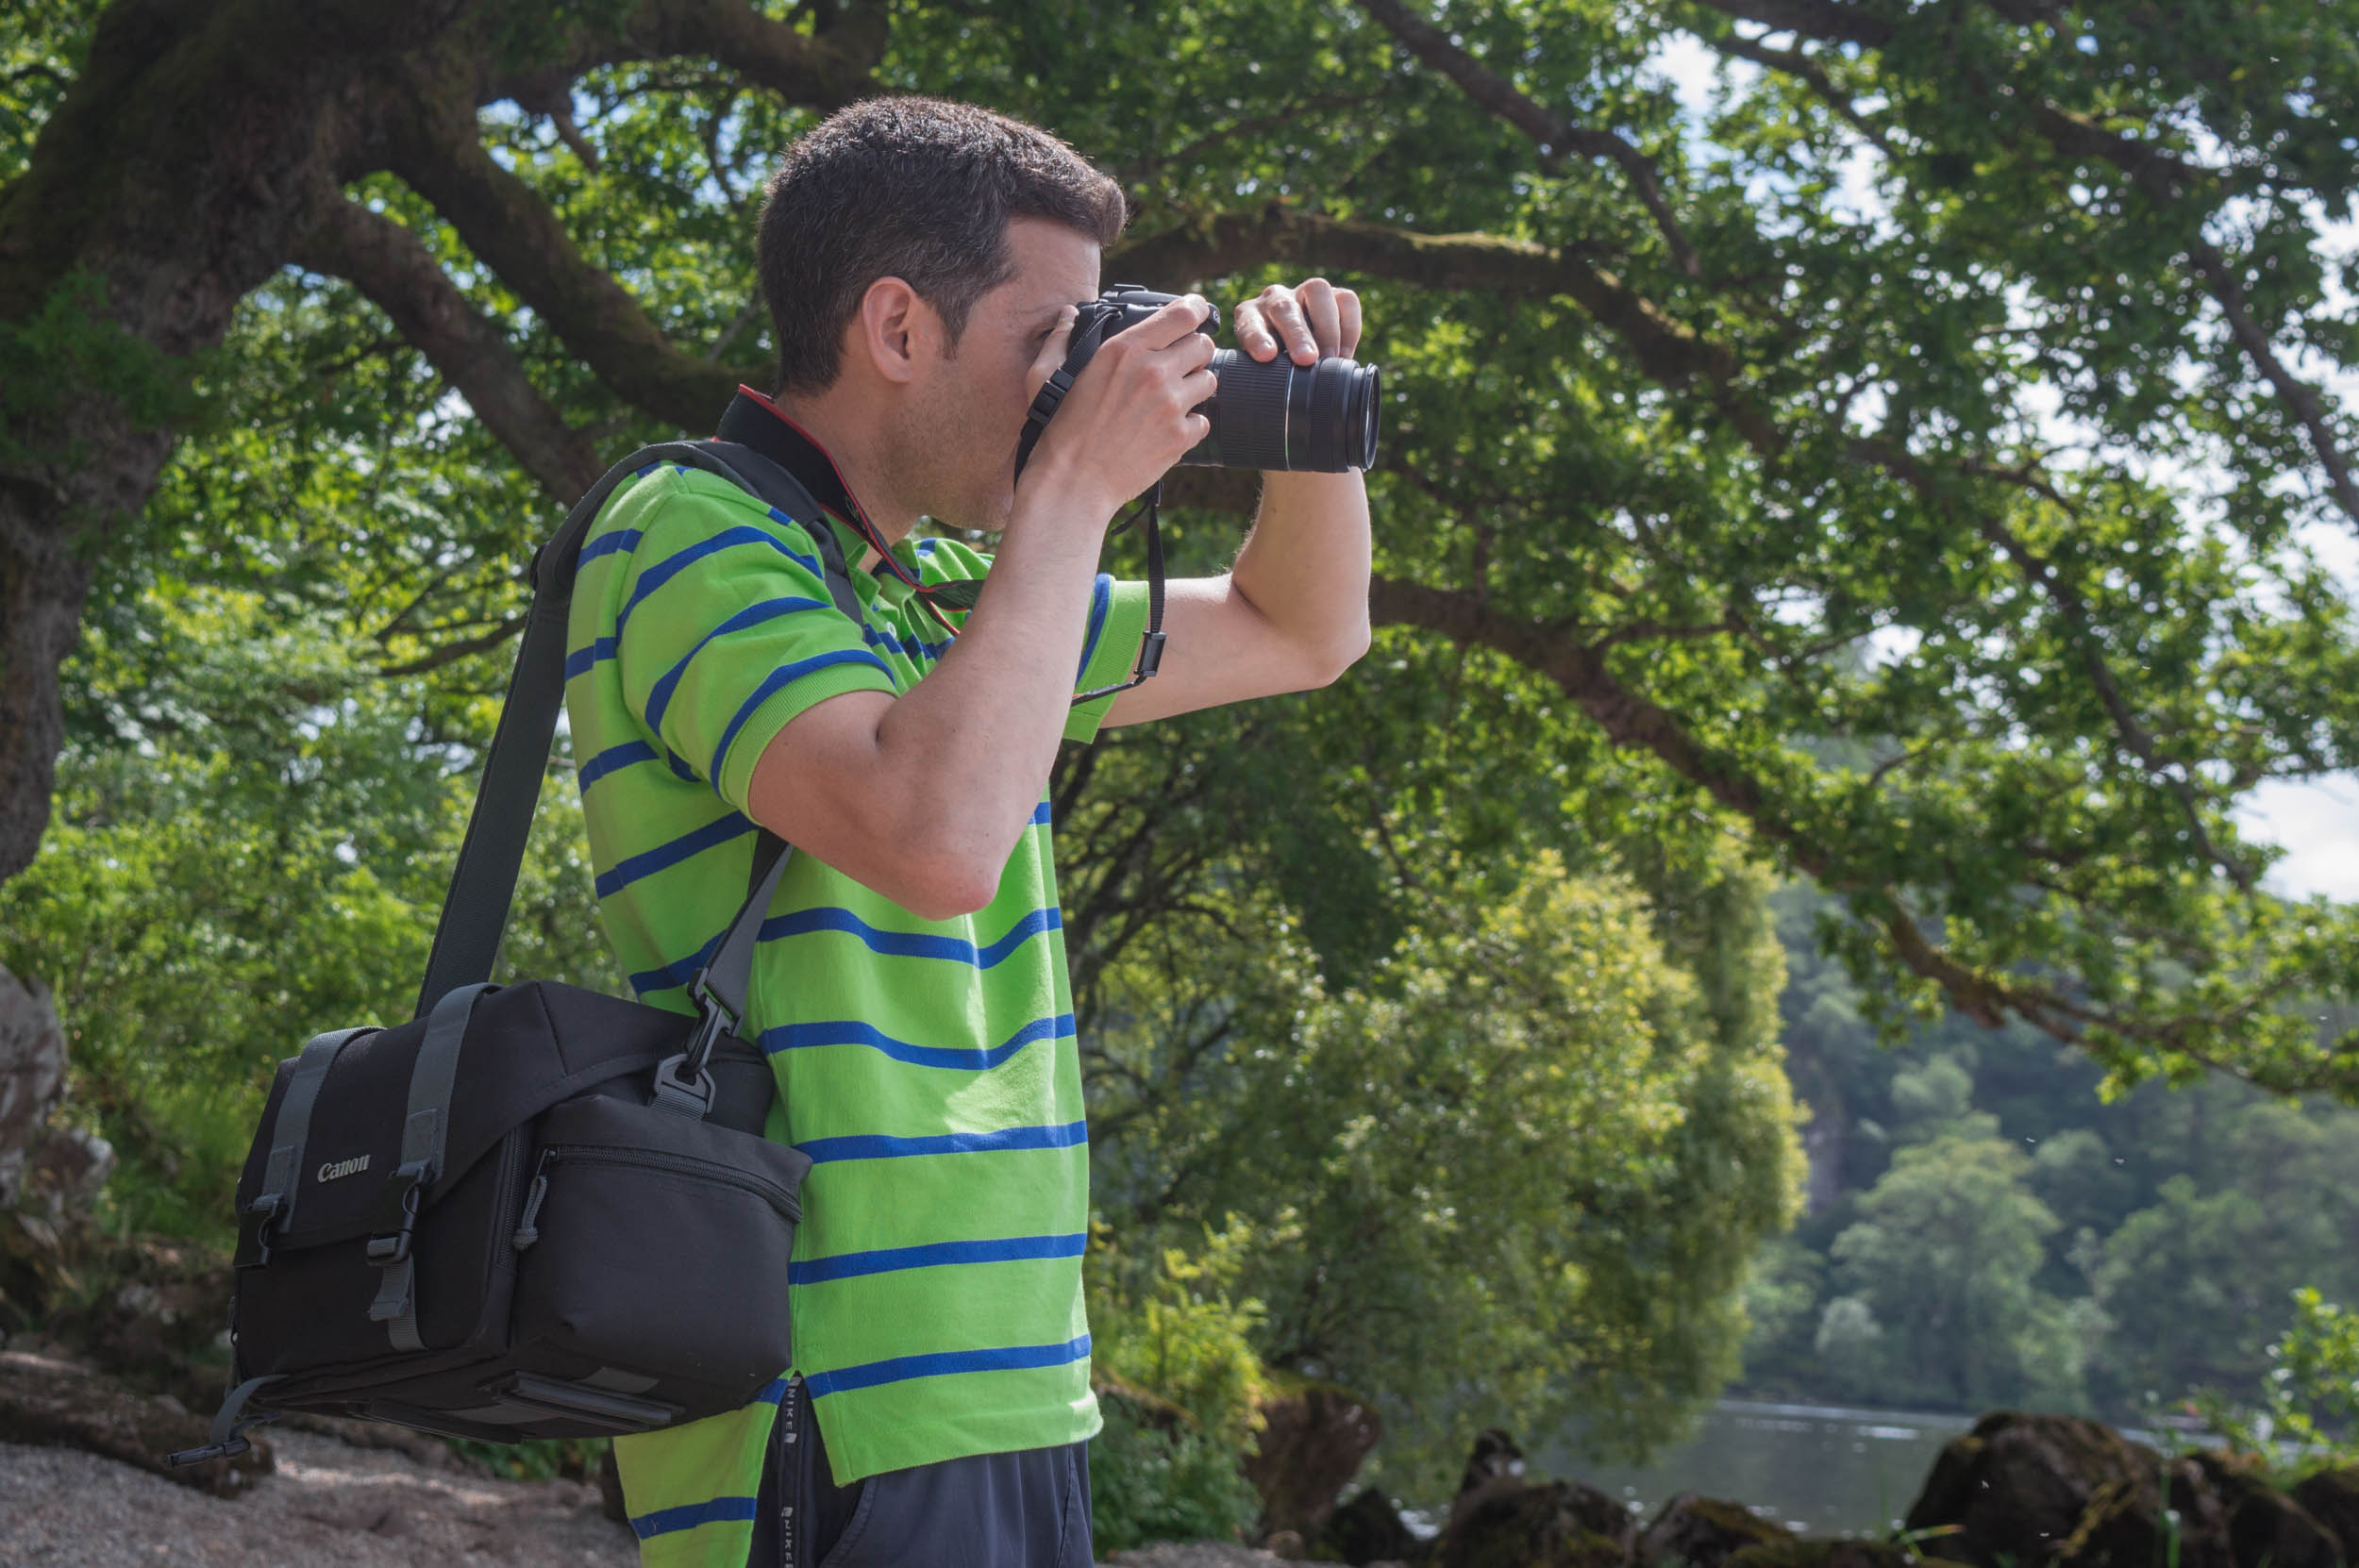 Paul-Saunders-Photography-2-2.jpg